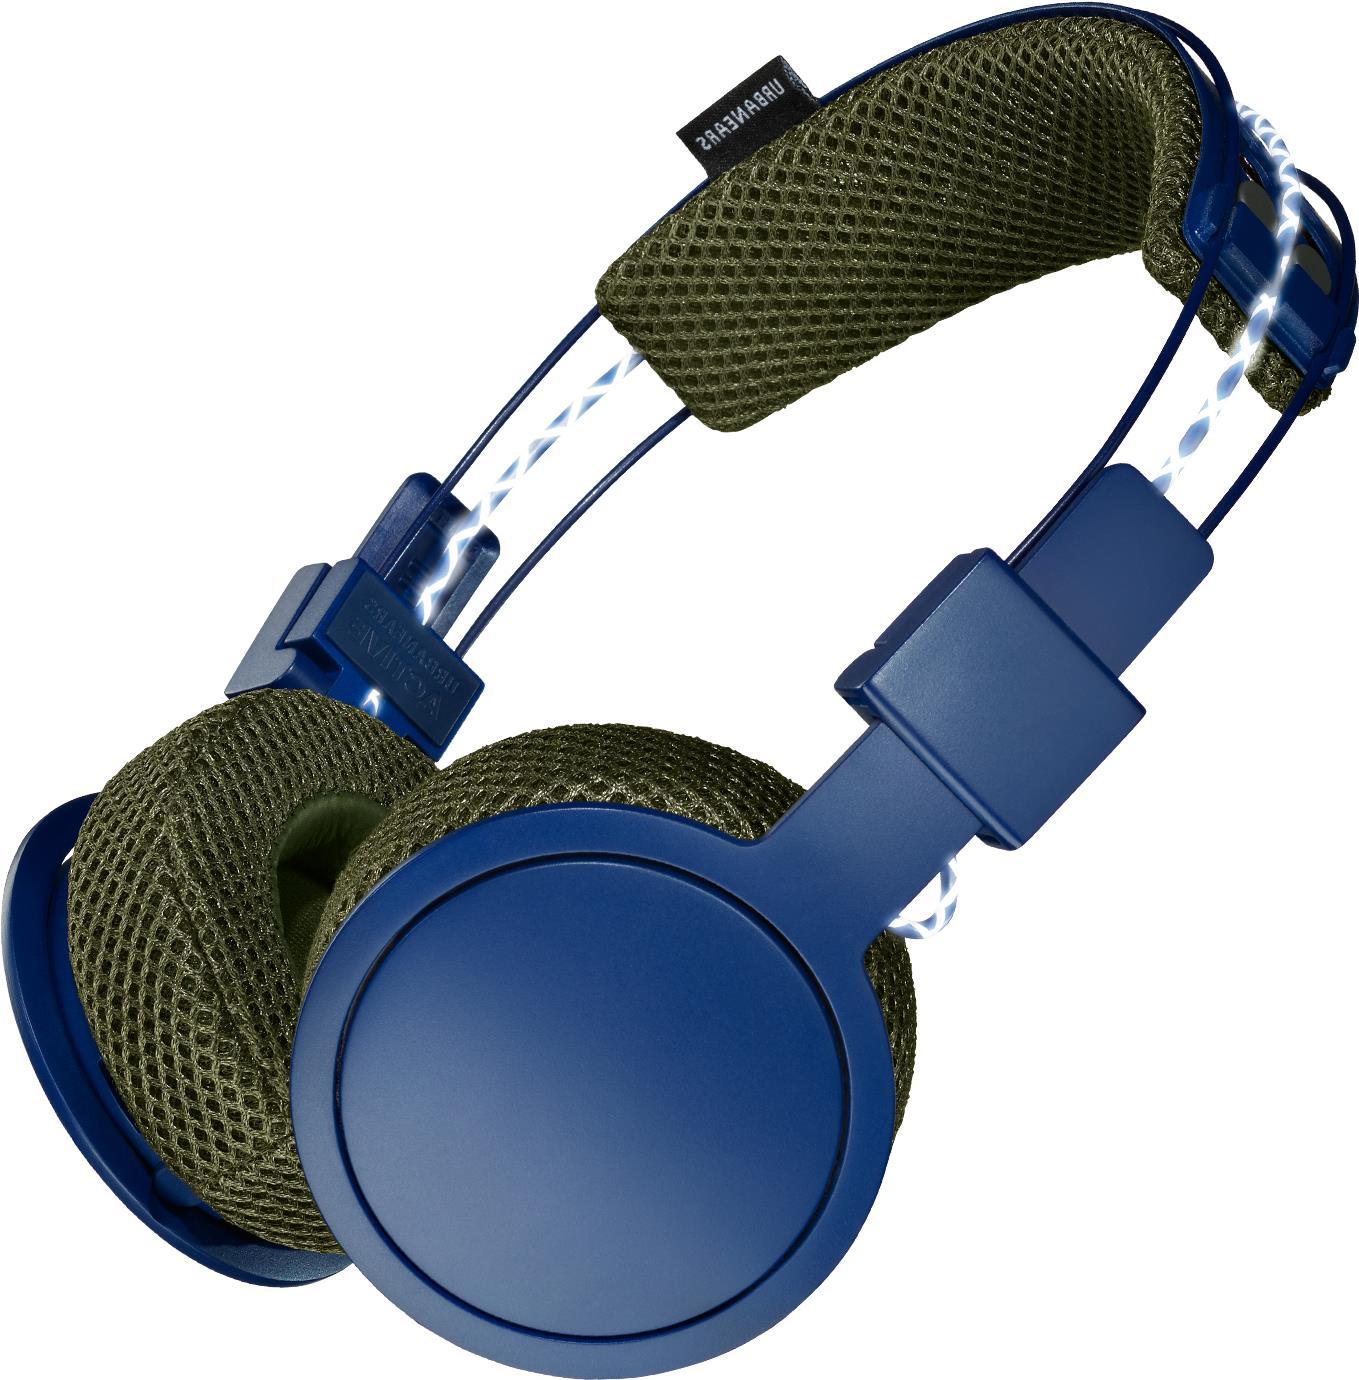 Audiozubehör - Urbanears Hellas Kopfhörer mit Mikrofon On Ear kabellos 3,5 mm Stecker Trail  - Onlineshop JACOB Elektronik